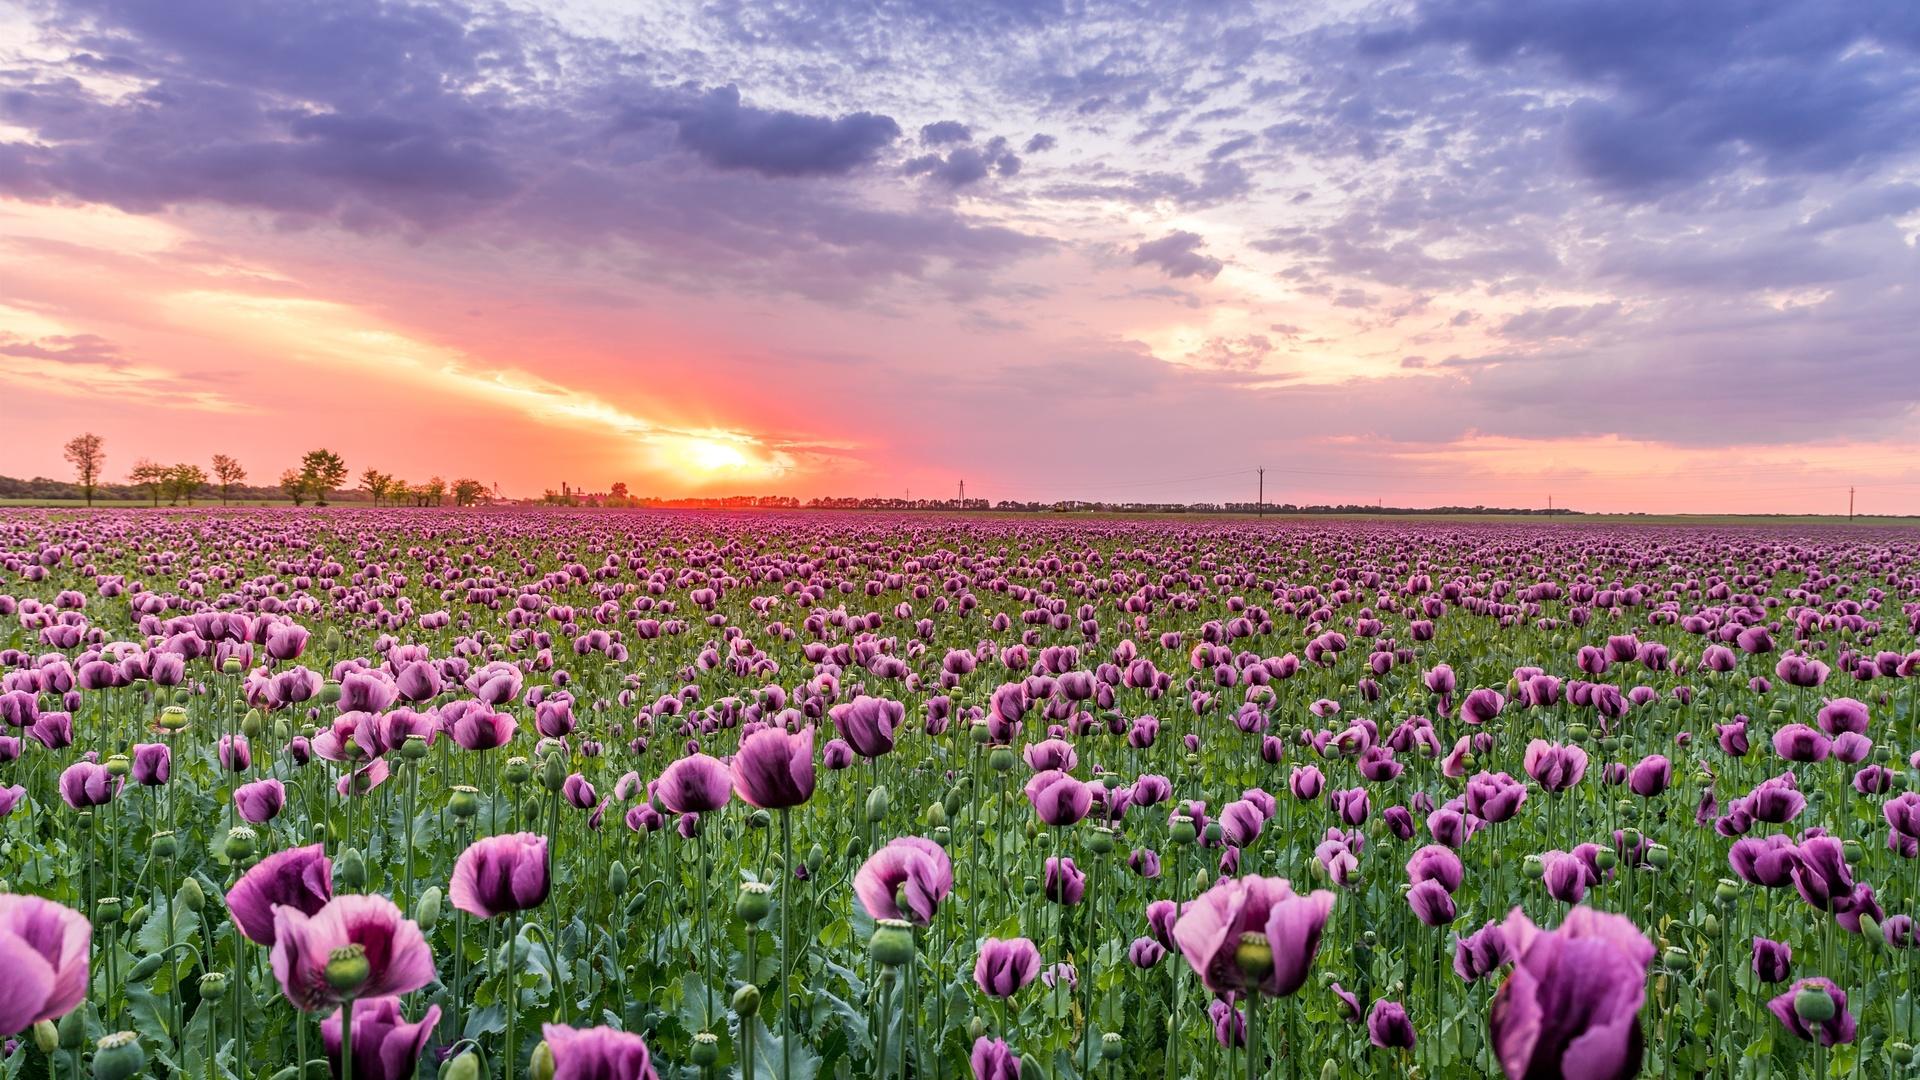 фиолетовый, маки, облака, закат, цветы